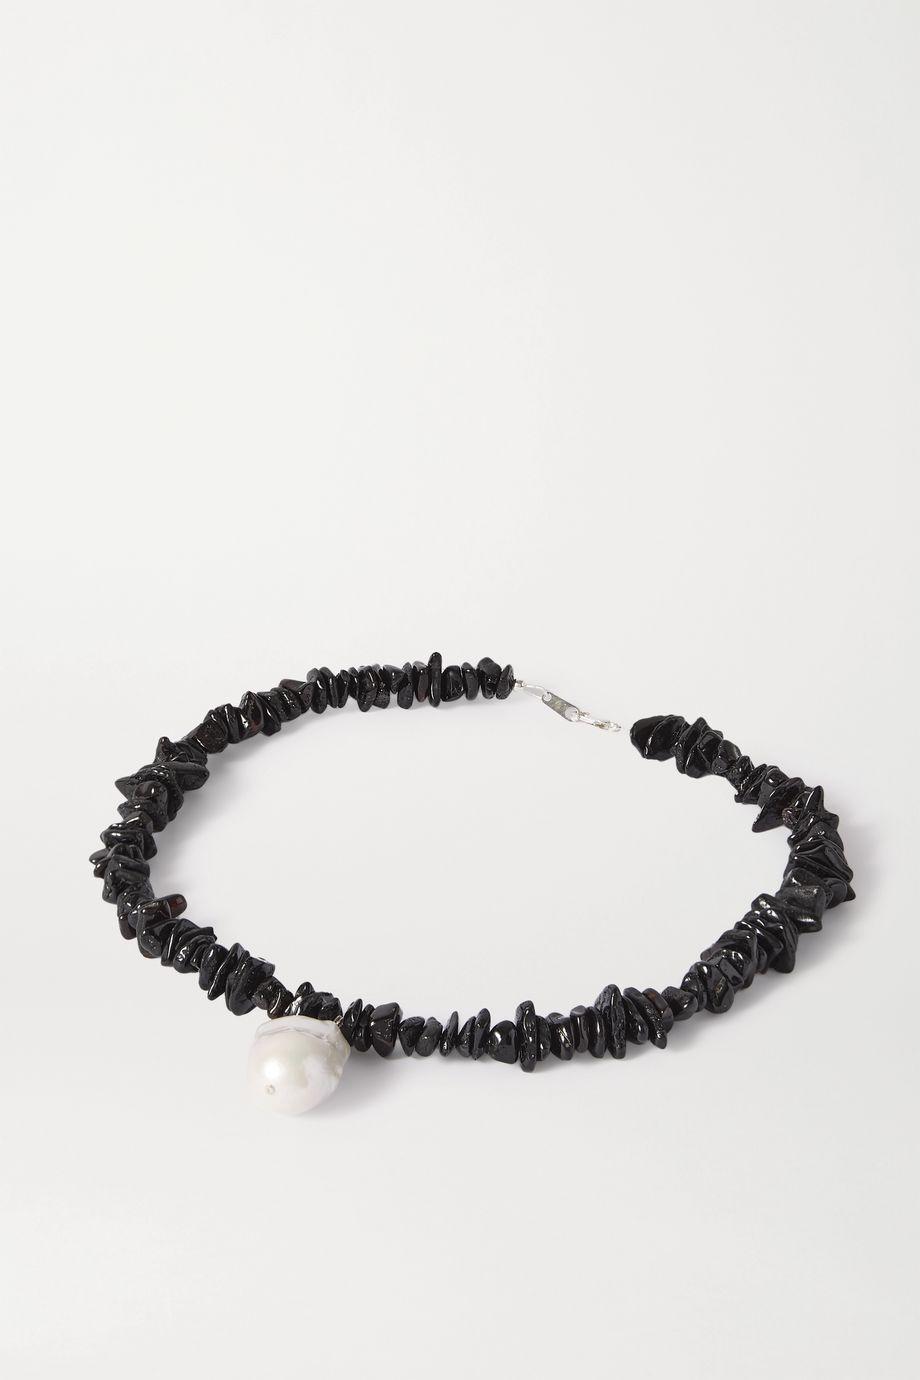 Santangelo Kitano 银质、琥珀、珍珠项链